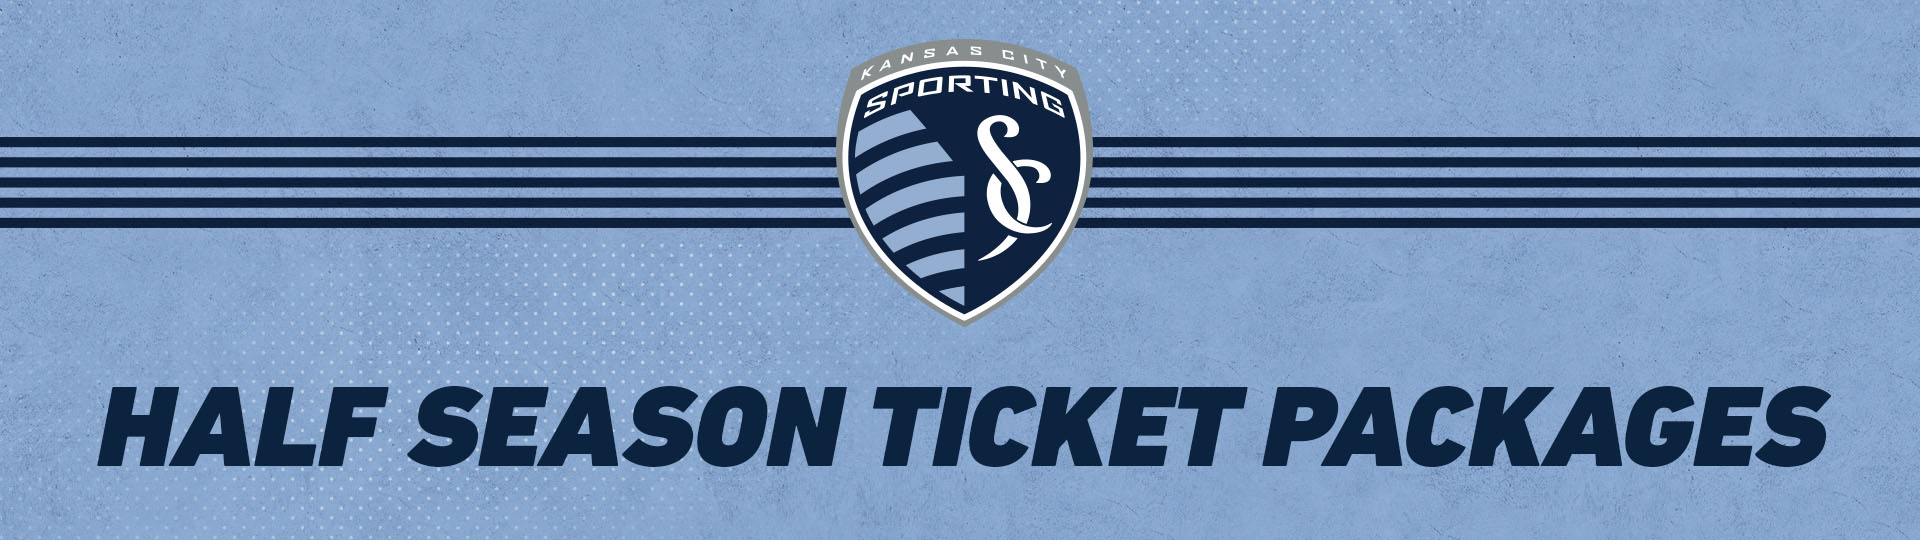 Sporting KC Half Season Tickets, Sporting Kansas City Half Season Tickets